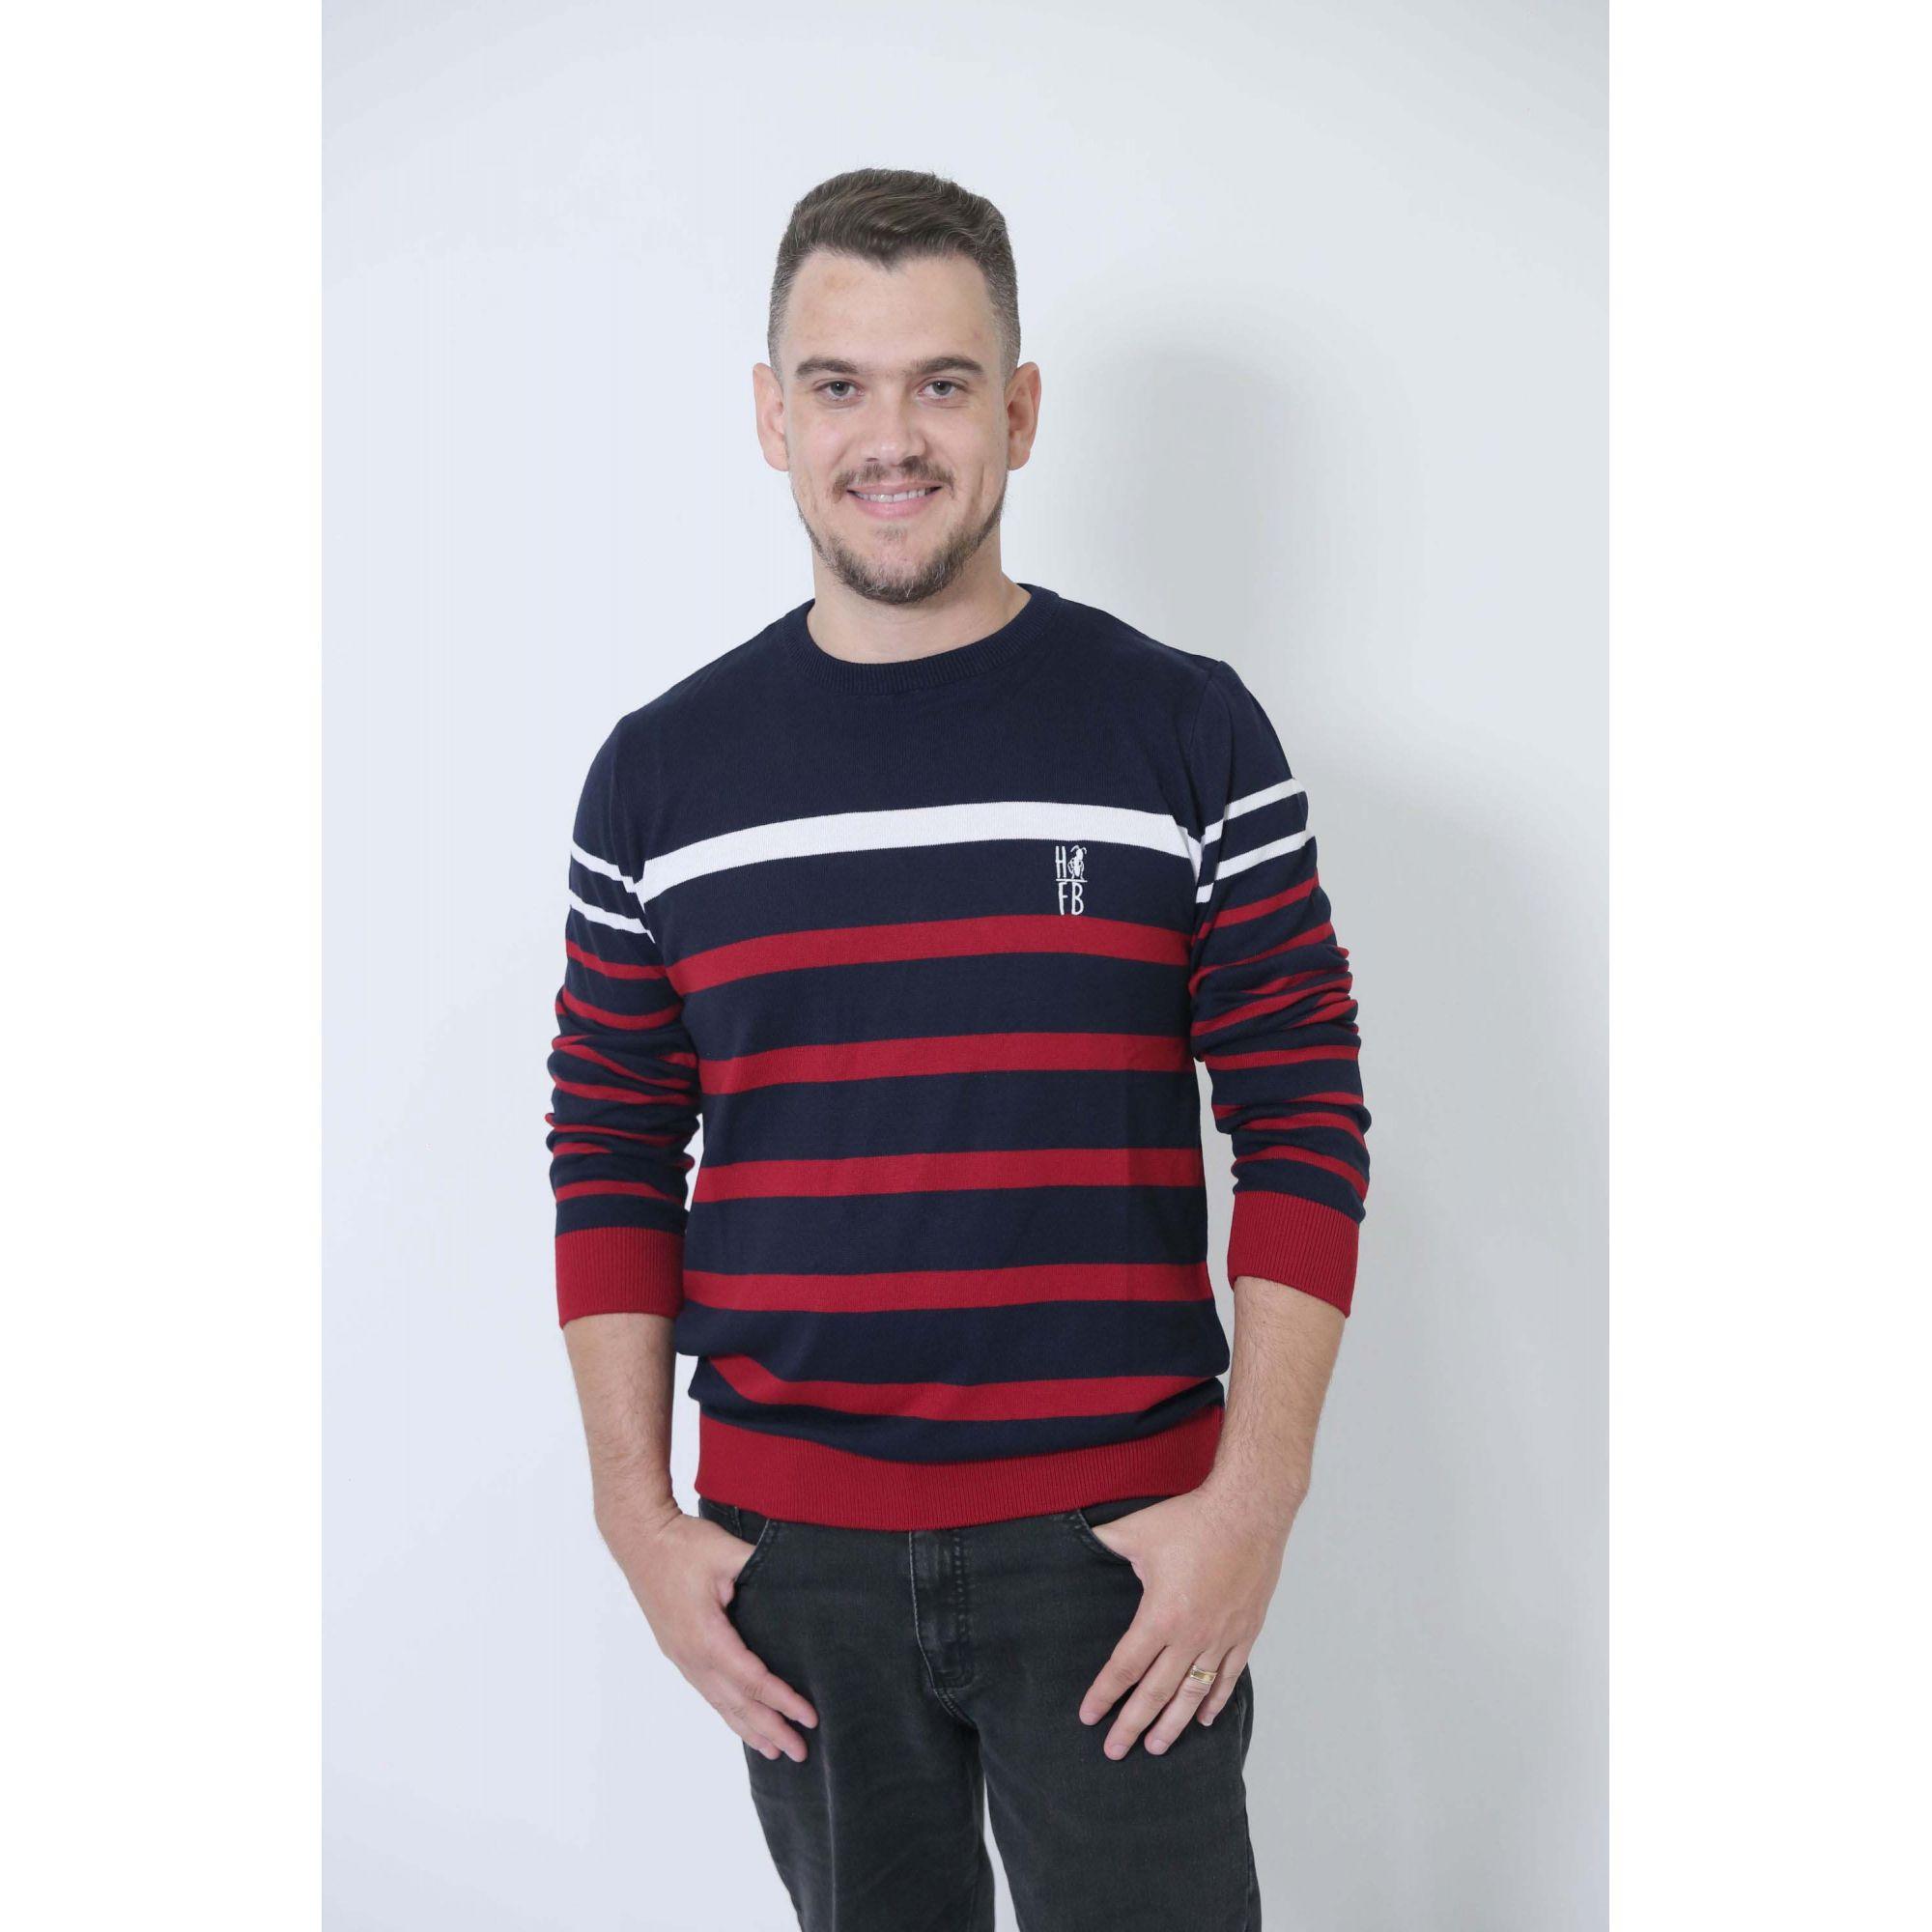 PAI E FILHO > Kit 02 Blusas Suéter Listrado [Coleção Tal Pai Tal Filho]  - Heitor Fashion Brazil